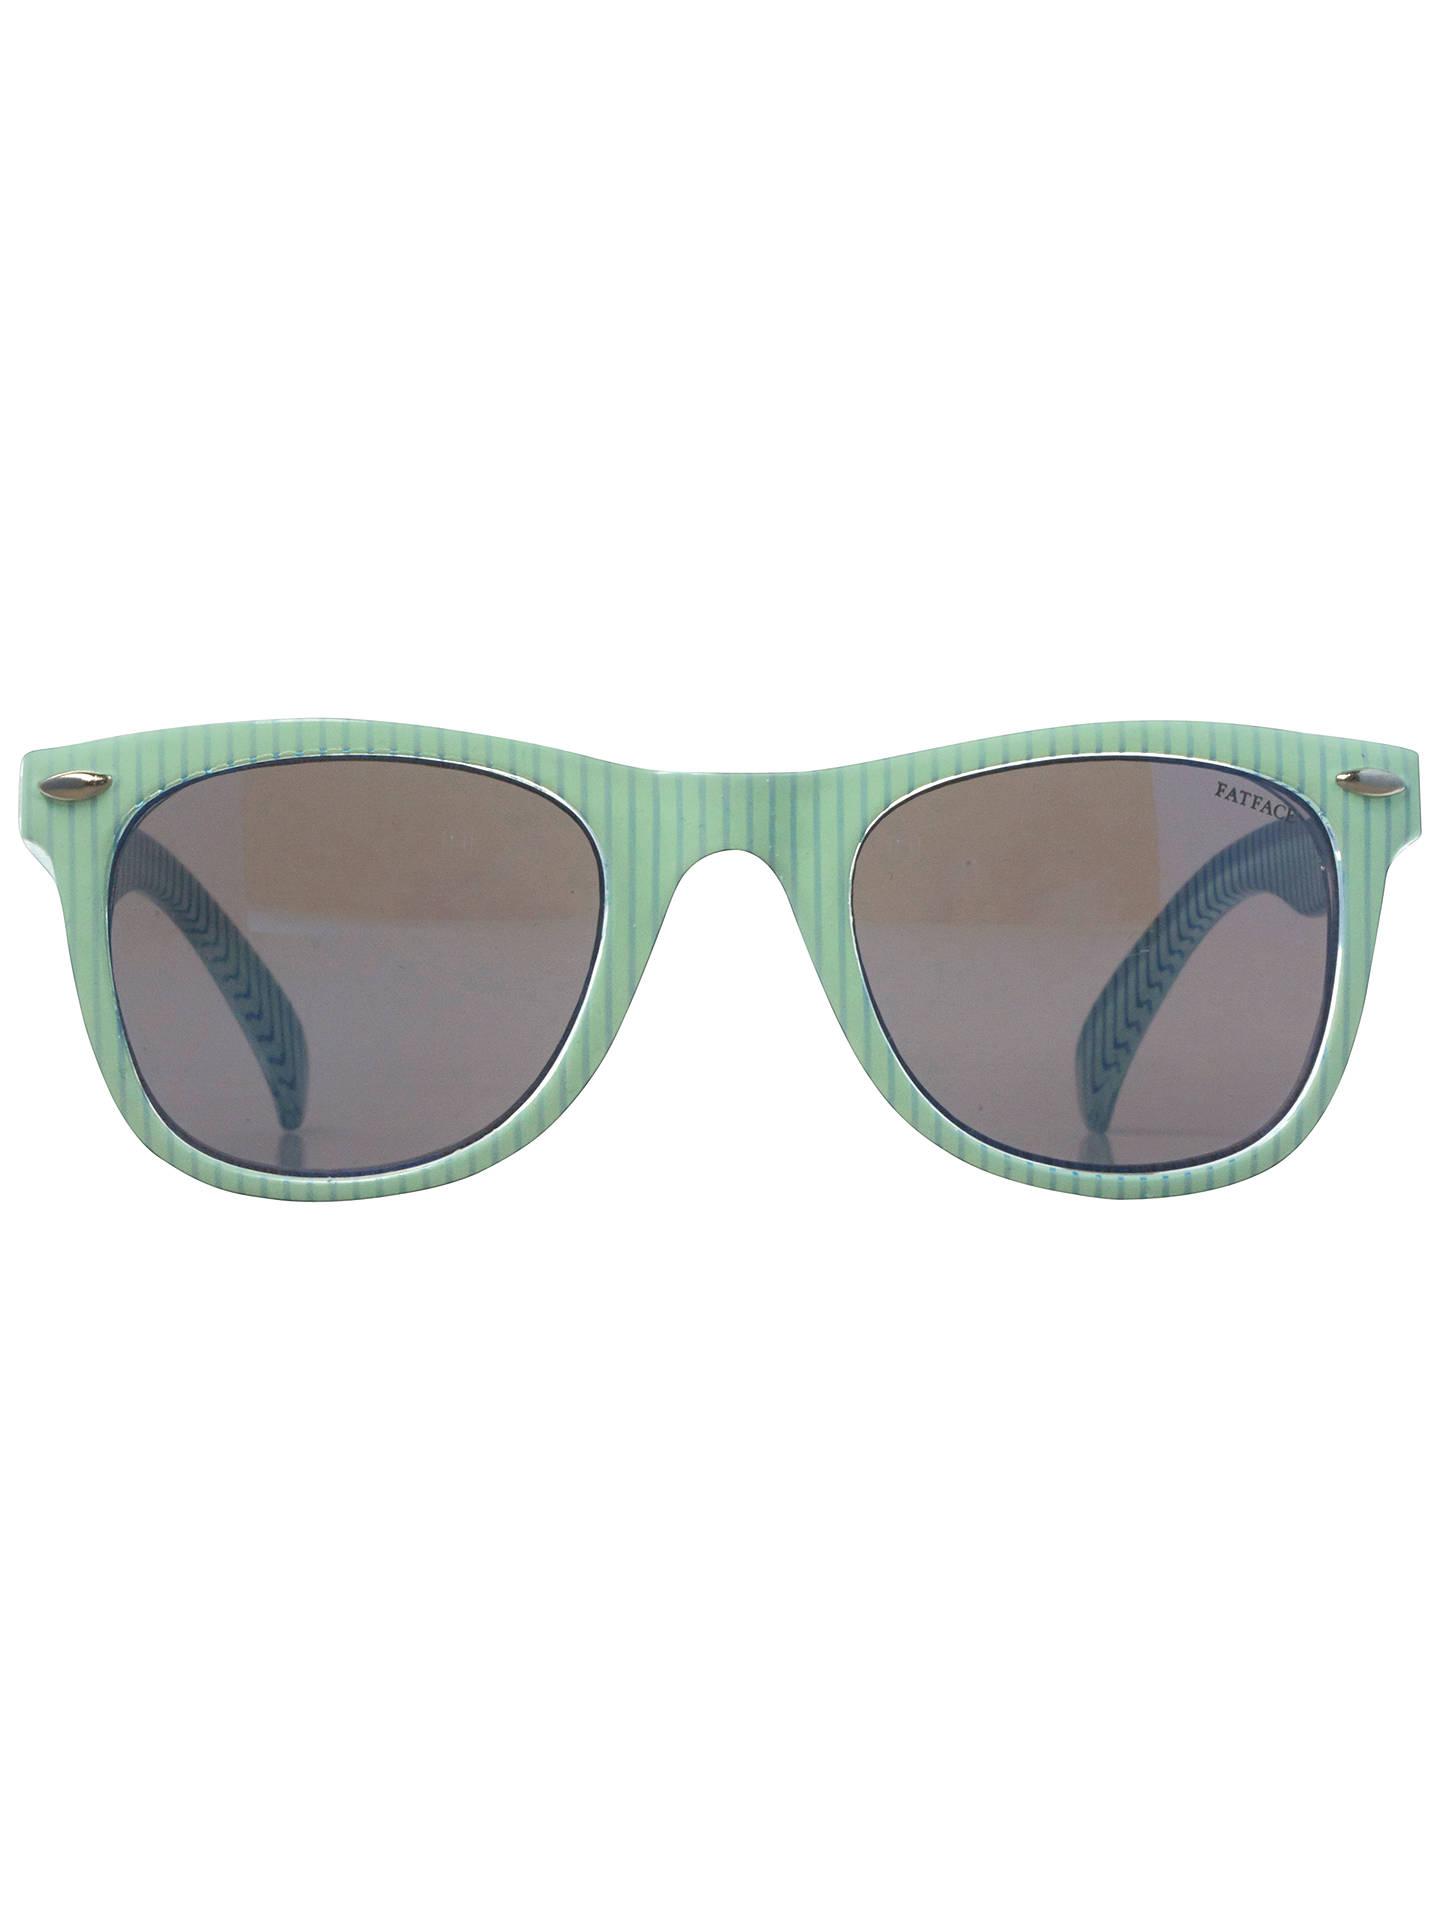 a92578d4a7 Buy Fat Face Children s Elodie Sunglasses